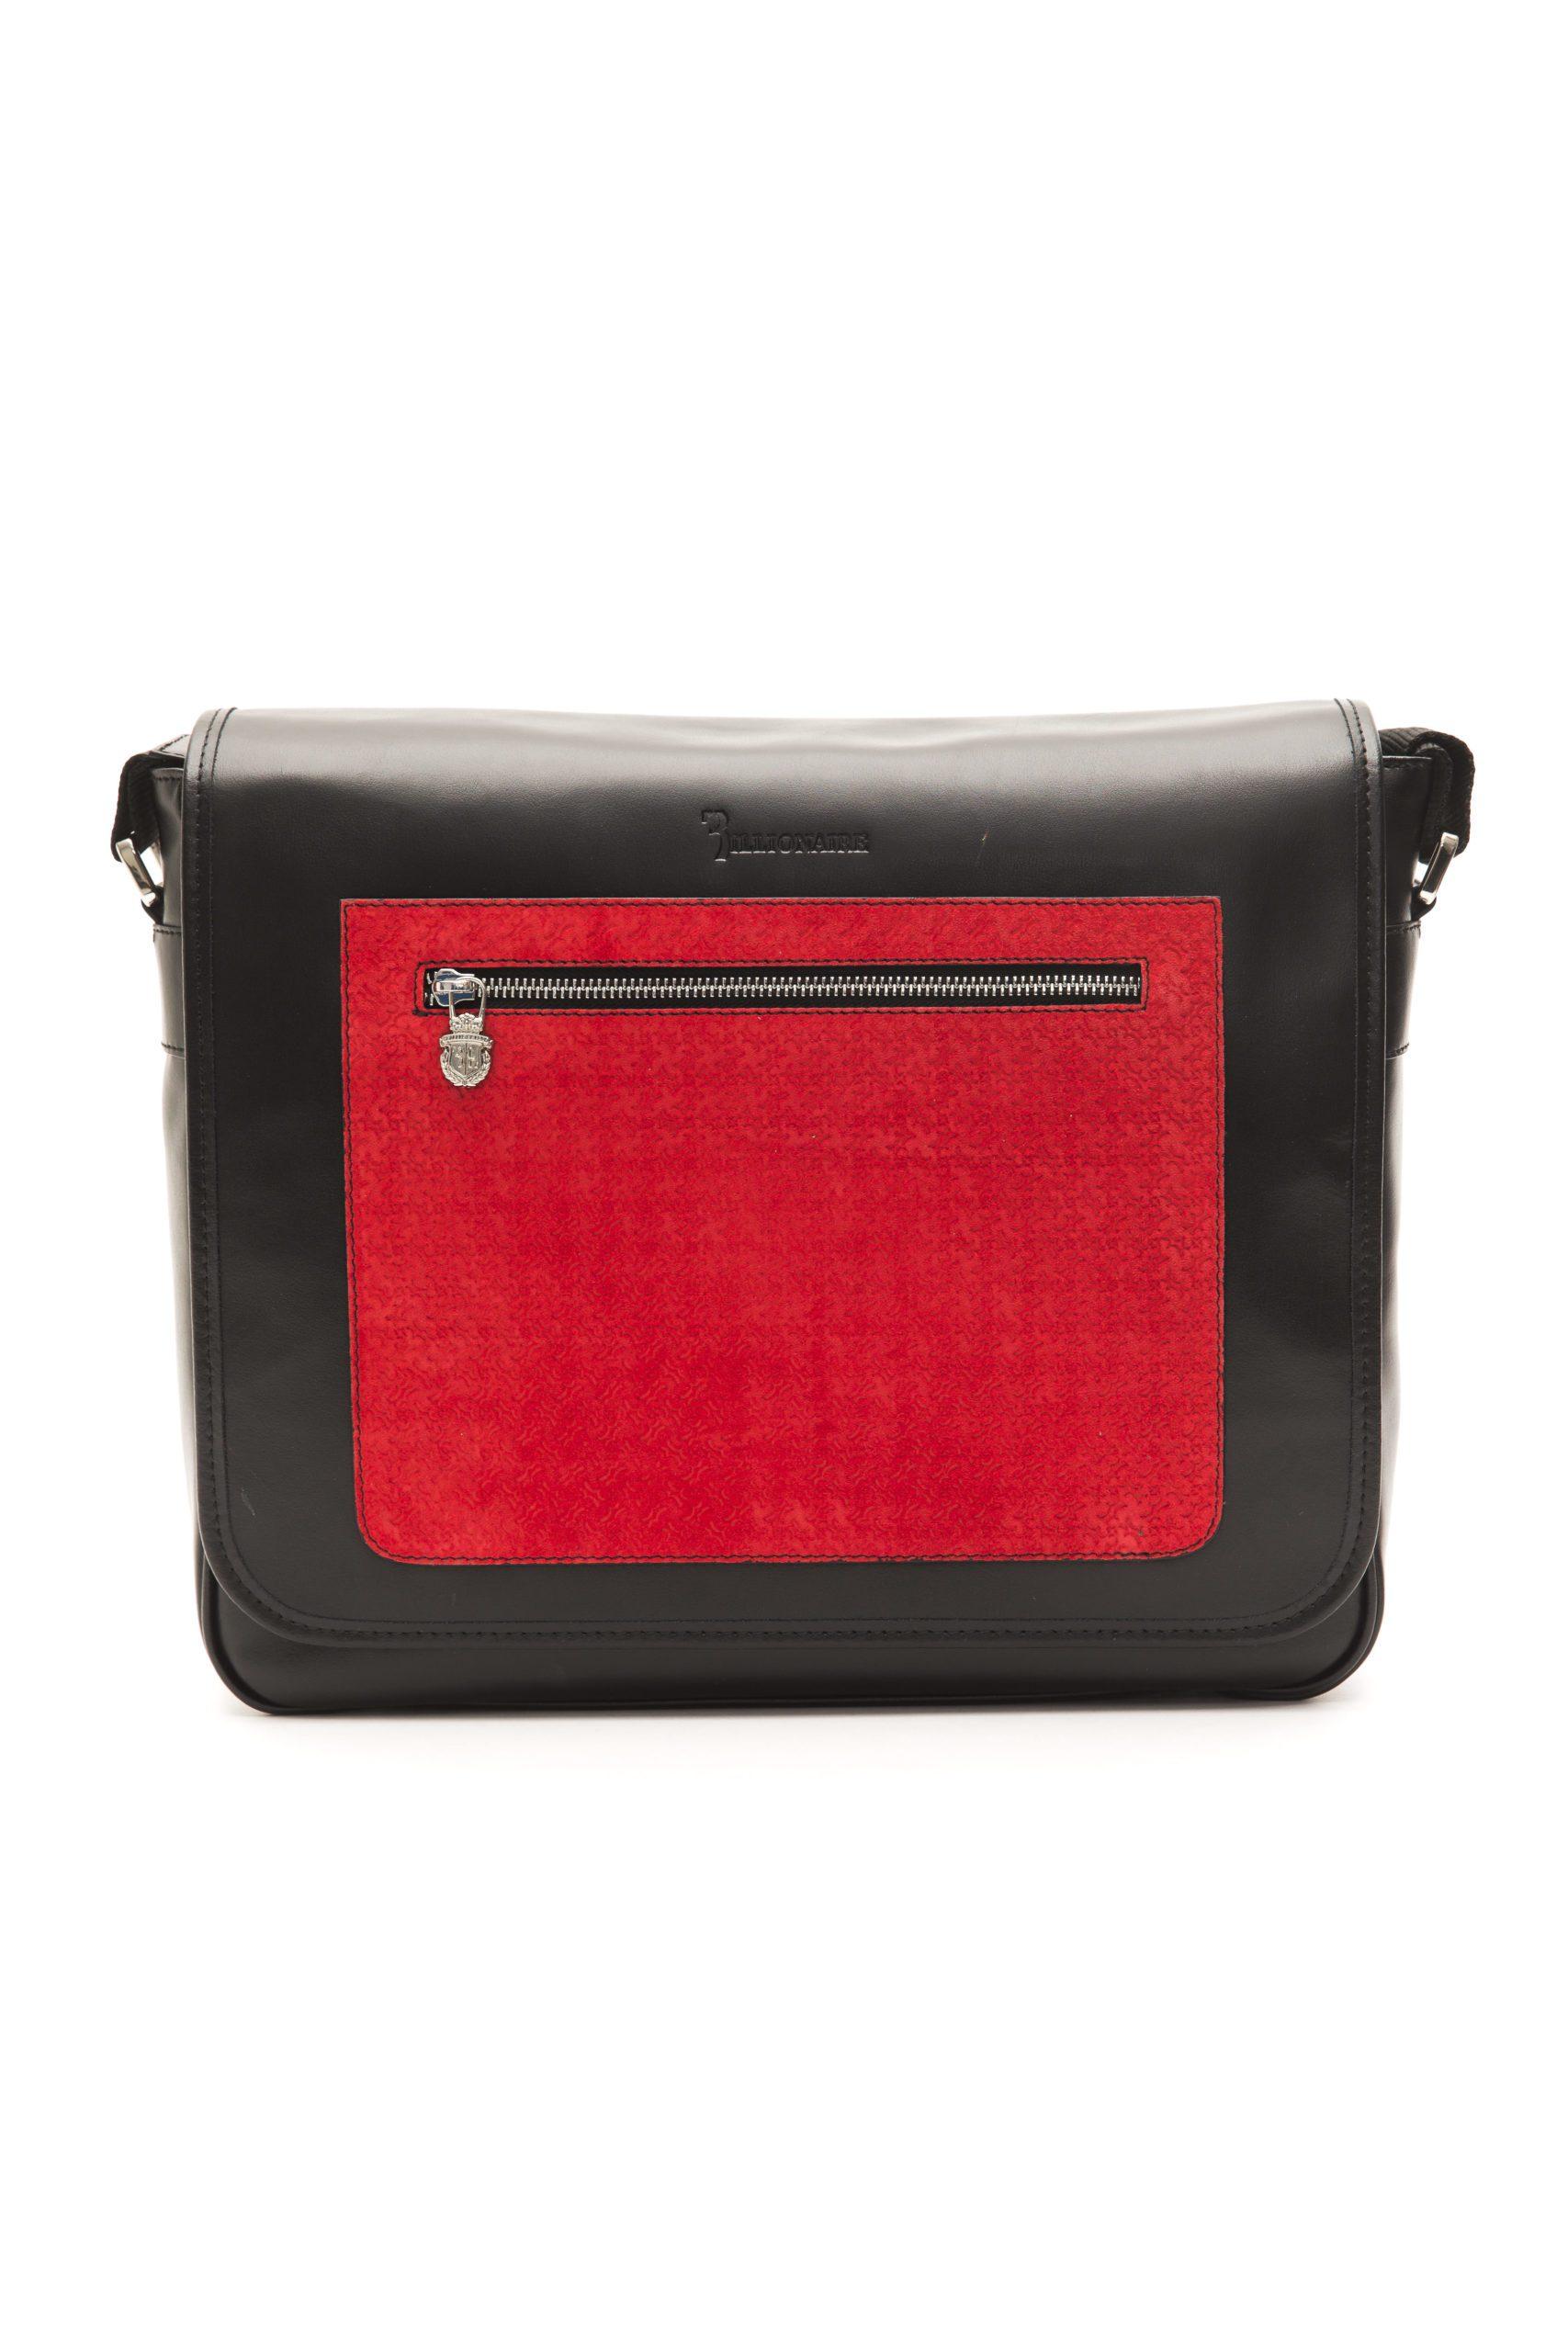 Billionaire Italian Couture Men's Messenger Bag Black BLC50406041A-034CV_BlackRed